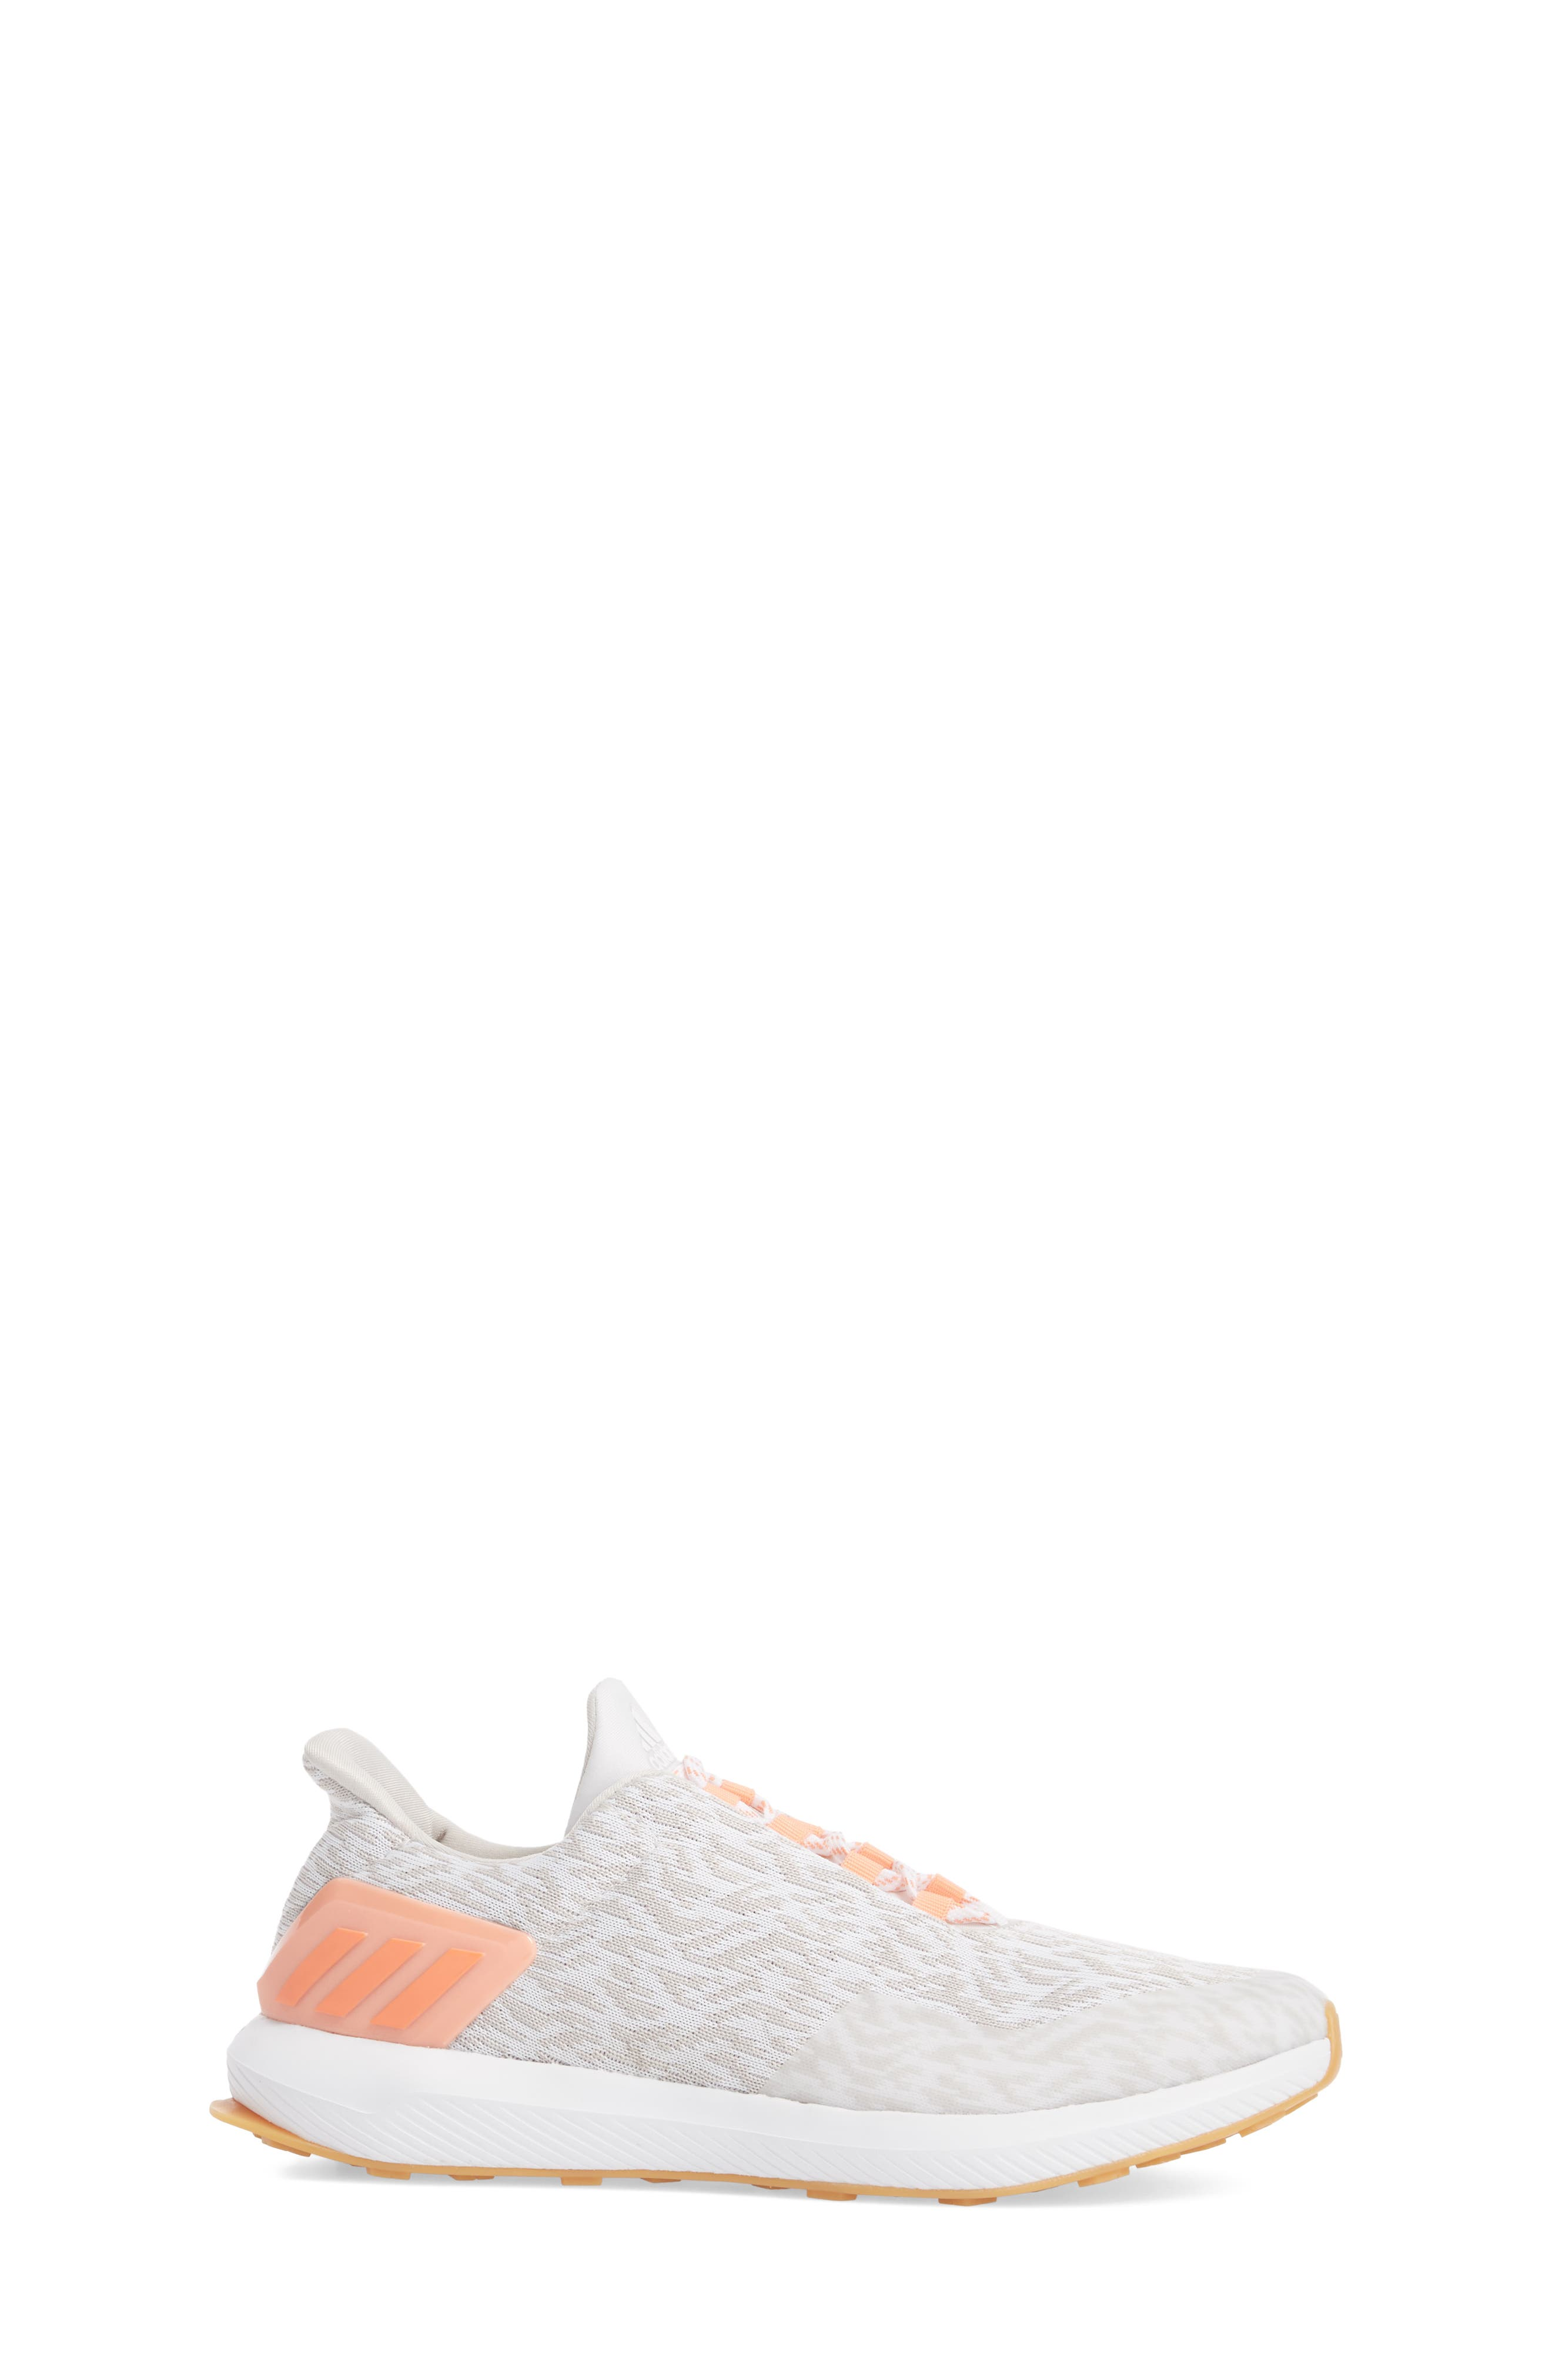 RapidaRun Uncaged Sneaker,                             Alternate thumbnail 3, color,                             021